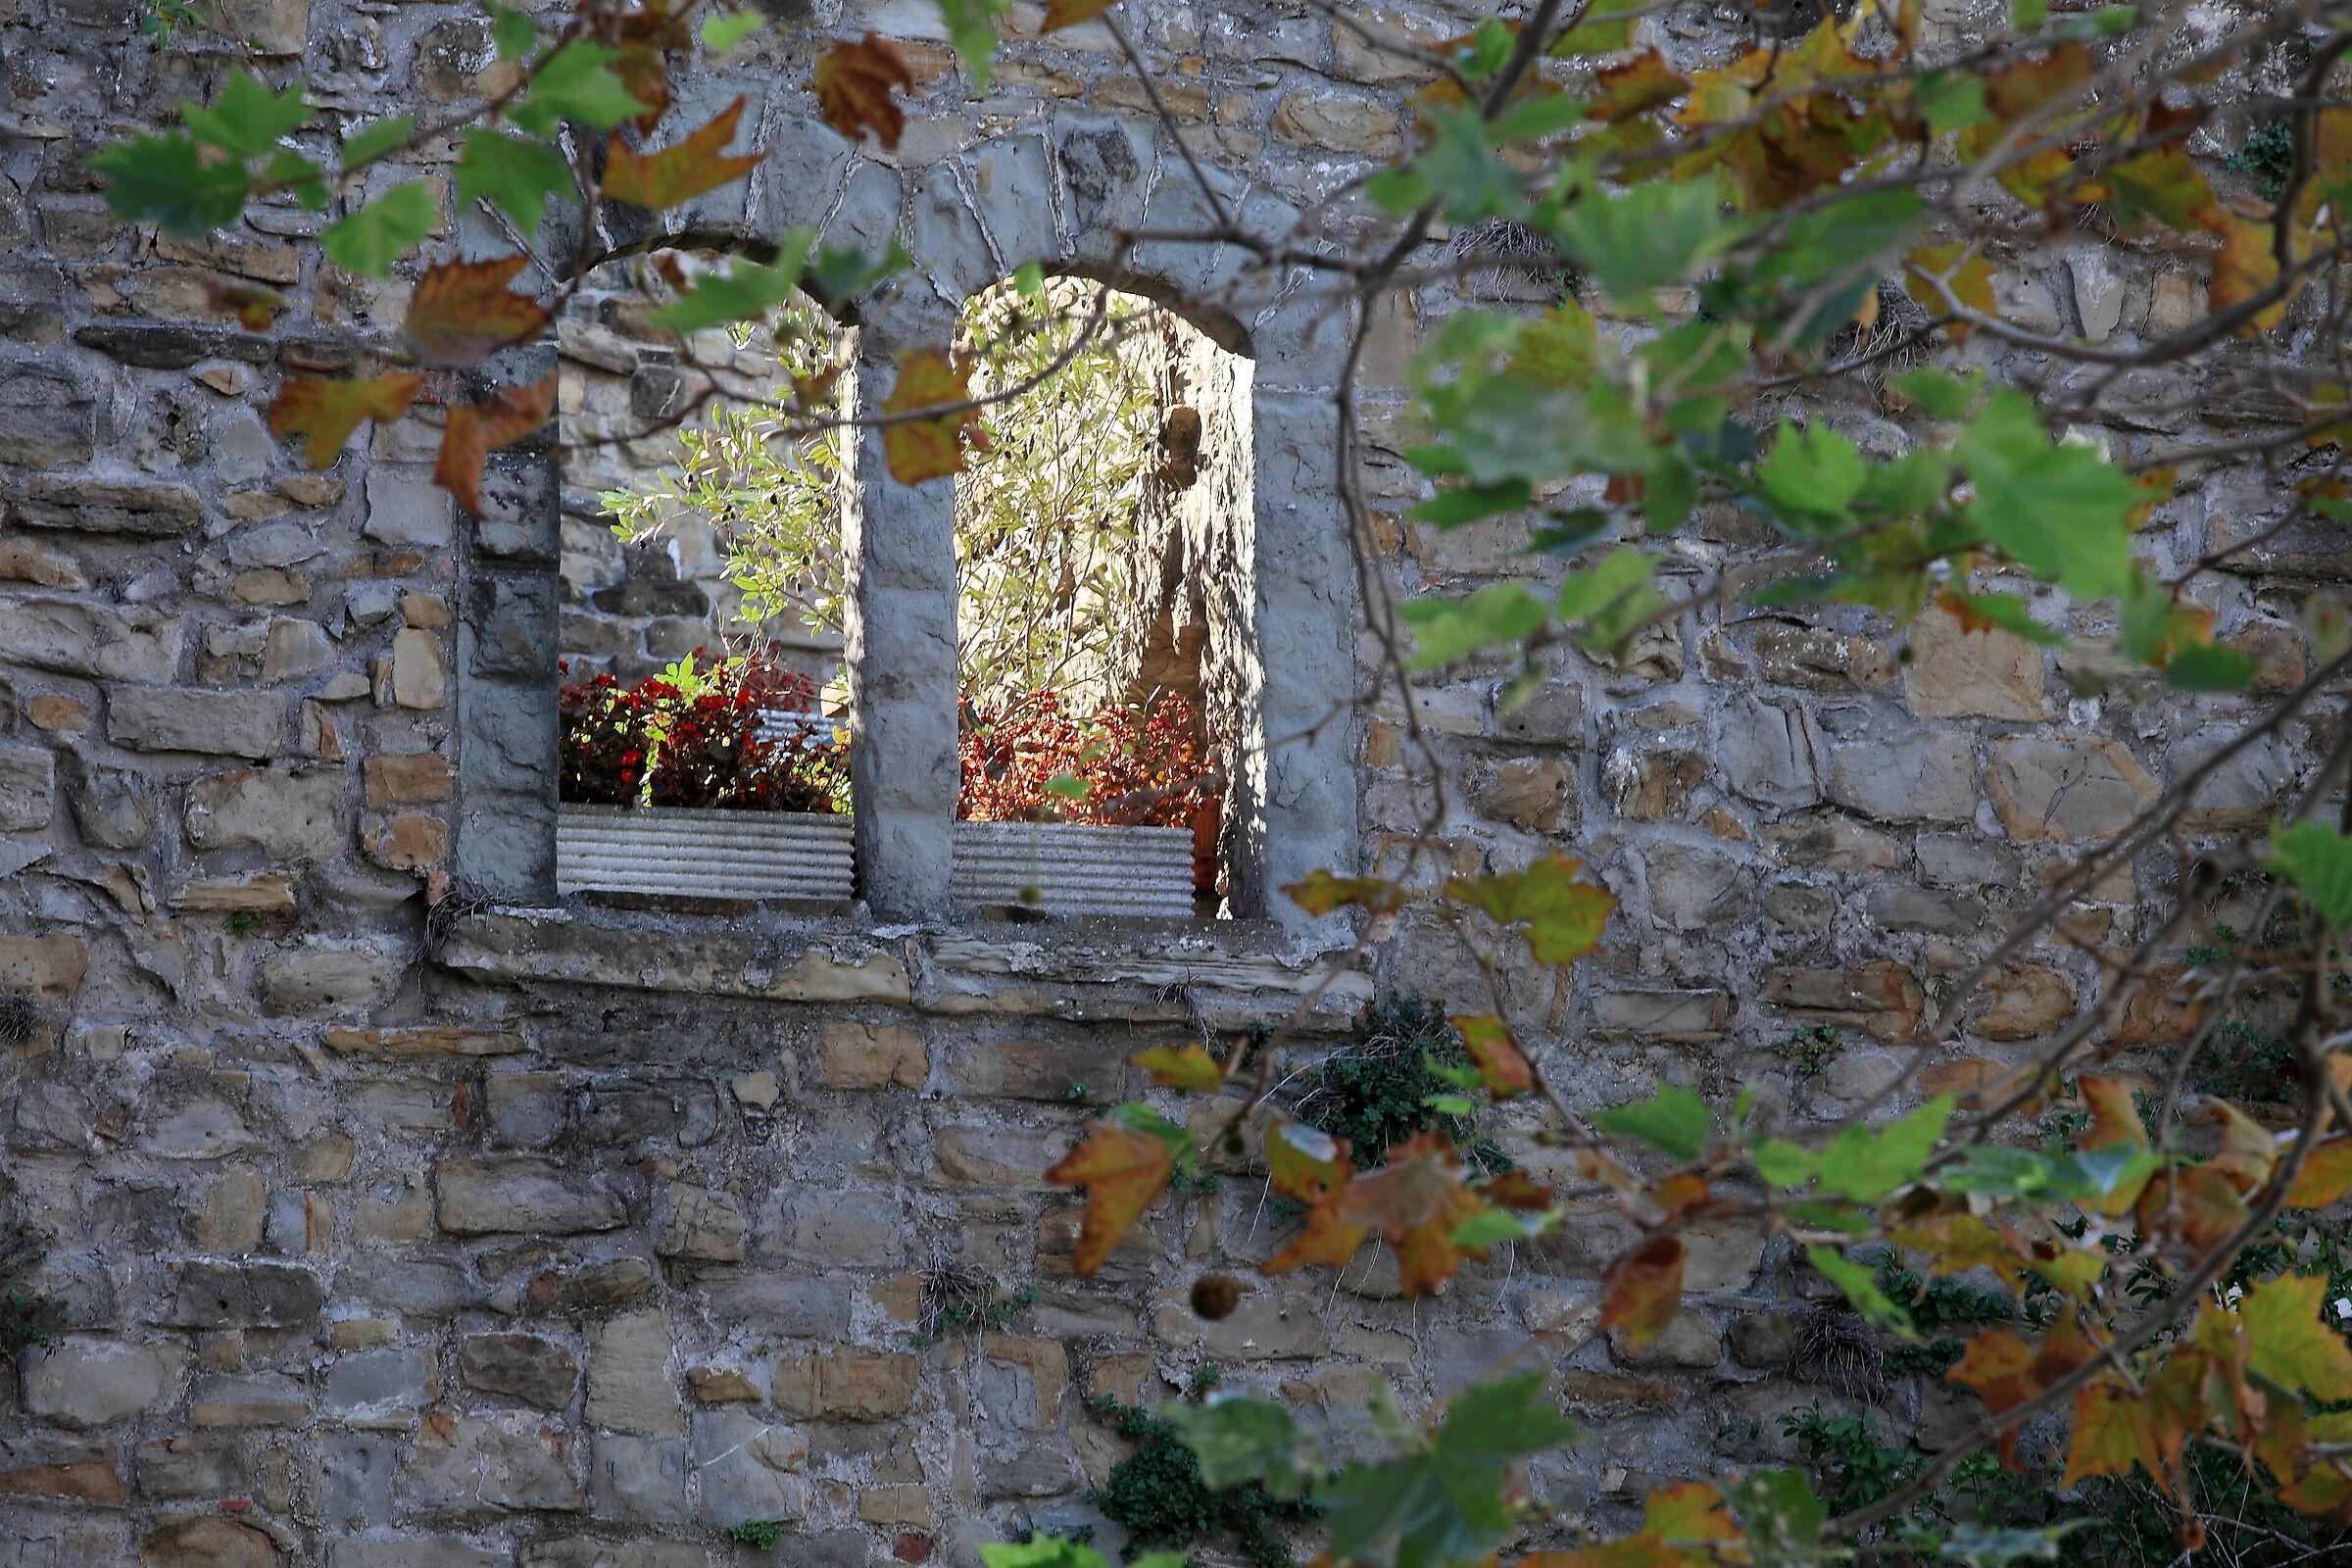 Muggesano glimpse (old walls)...